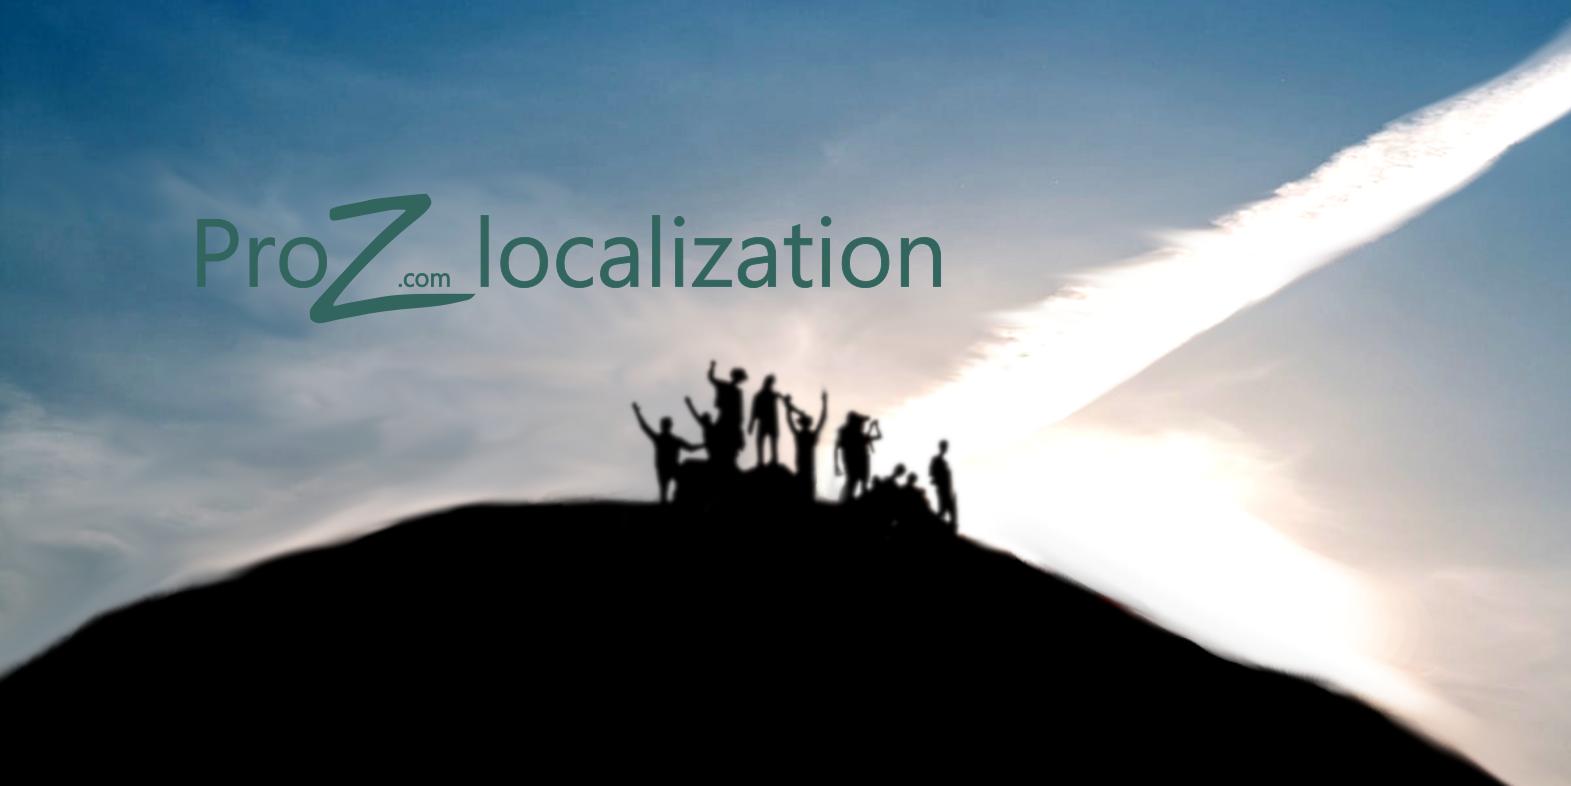 ProZlocalization